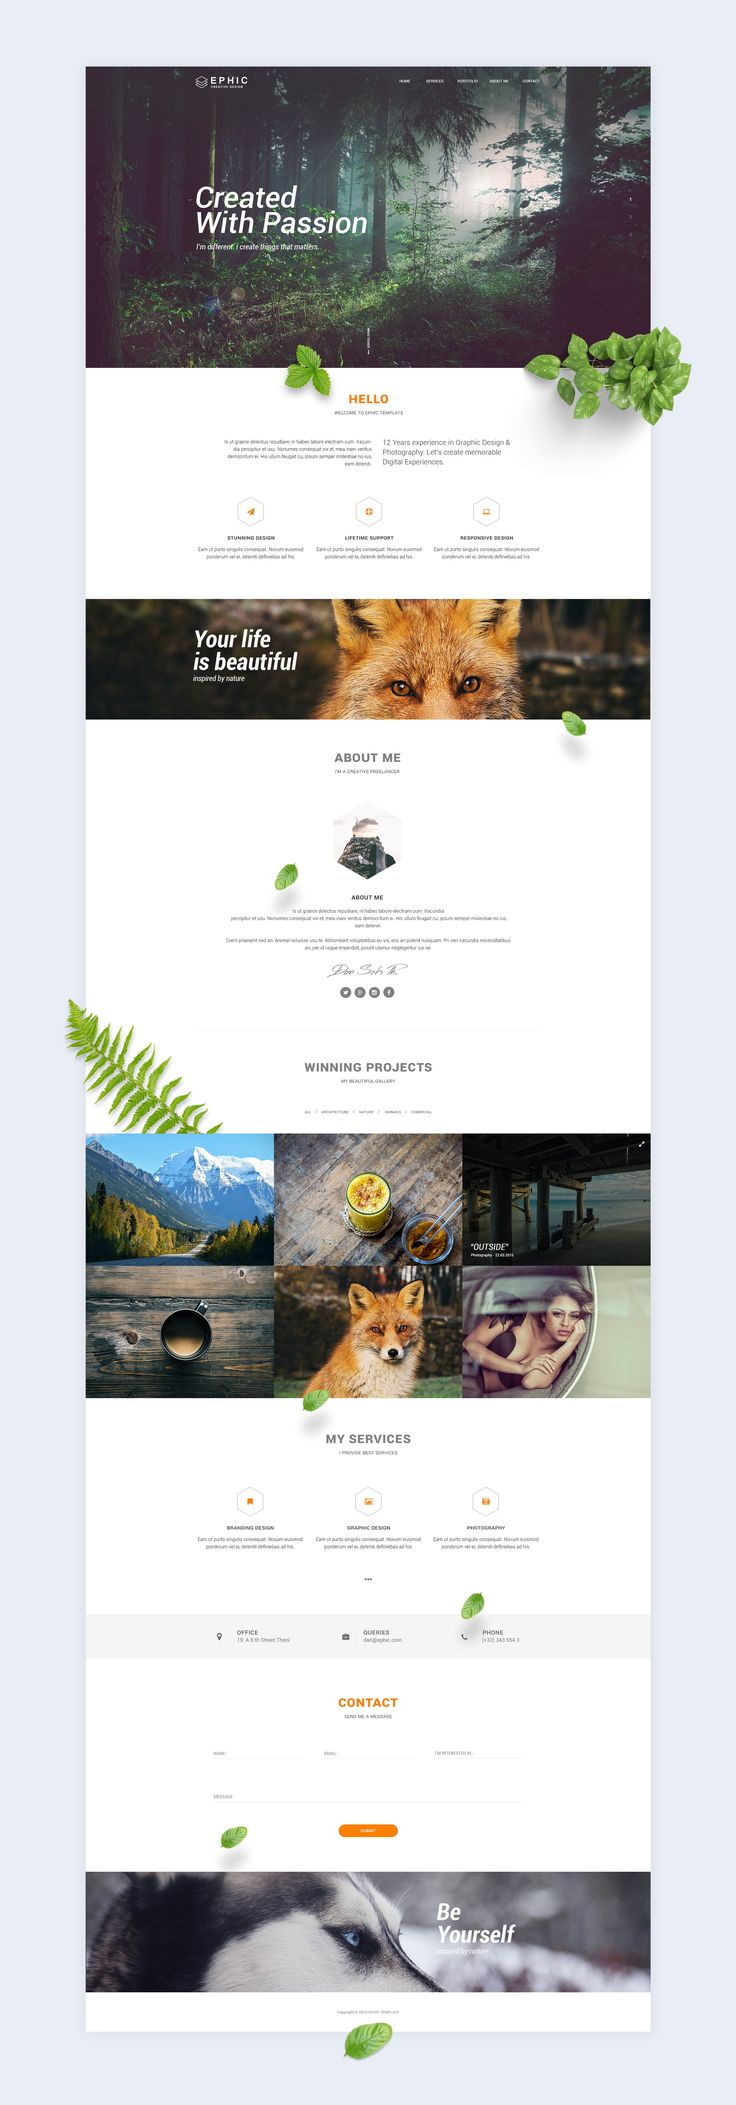 Ephic Template green presentation – Website by KonnstantinC